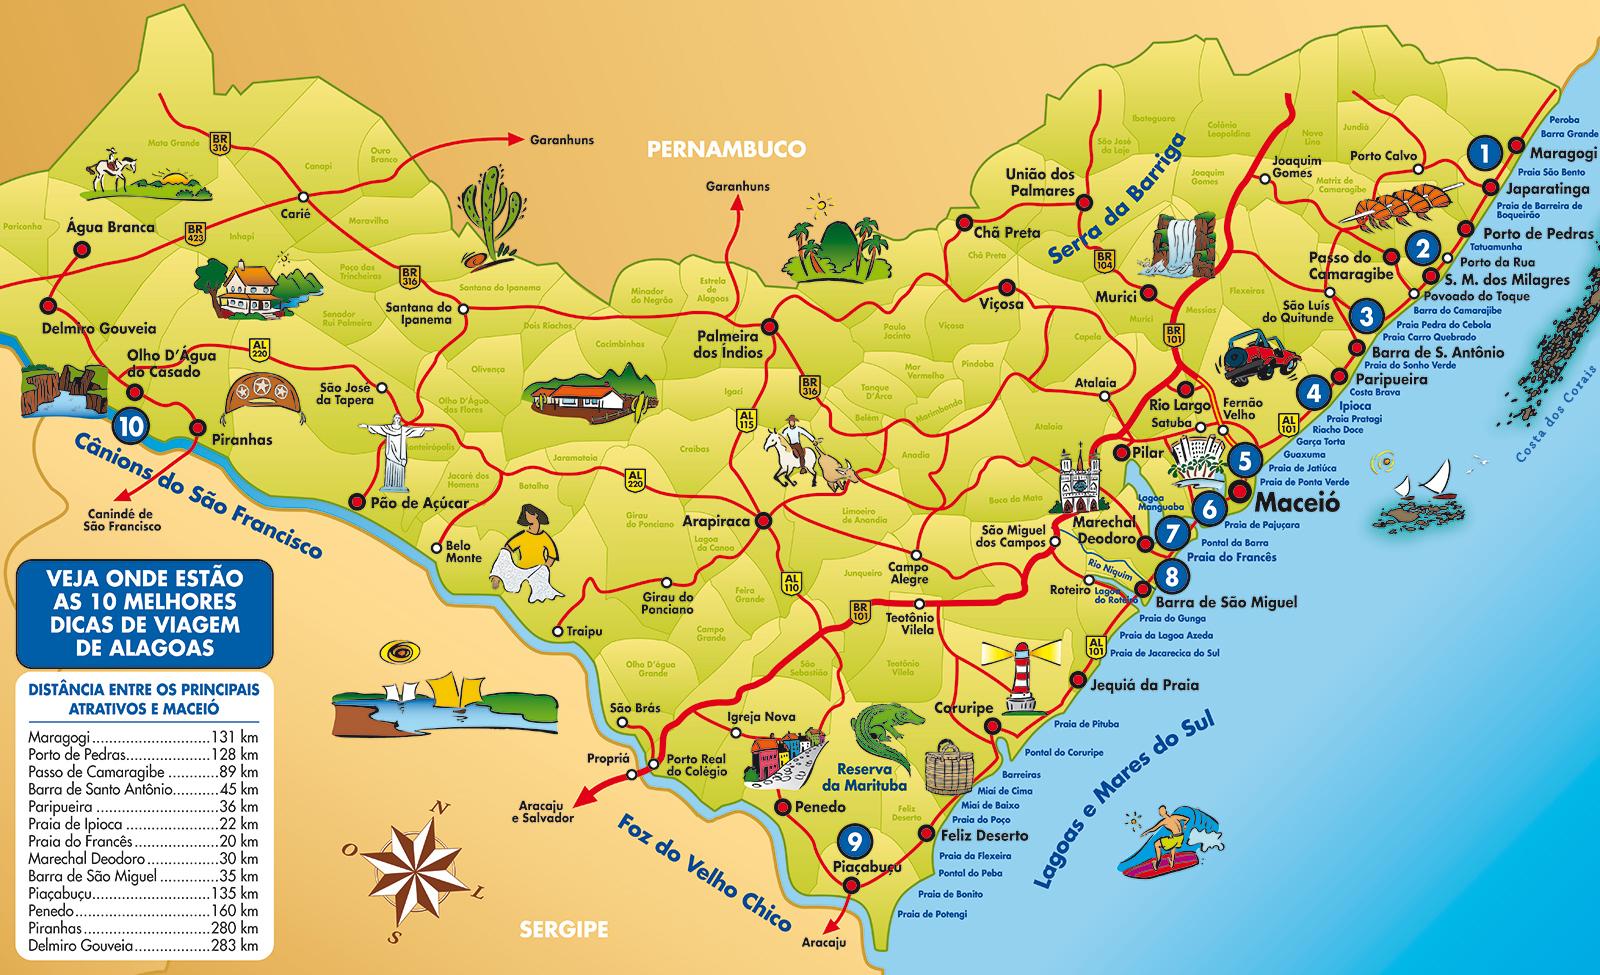 Mapa de praias de Alagoas